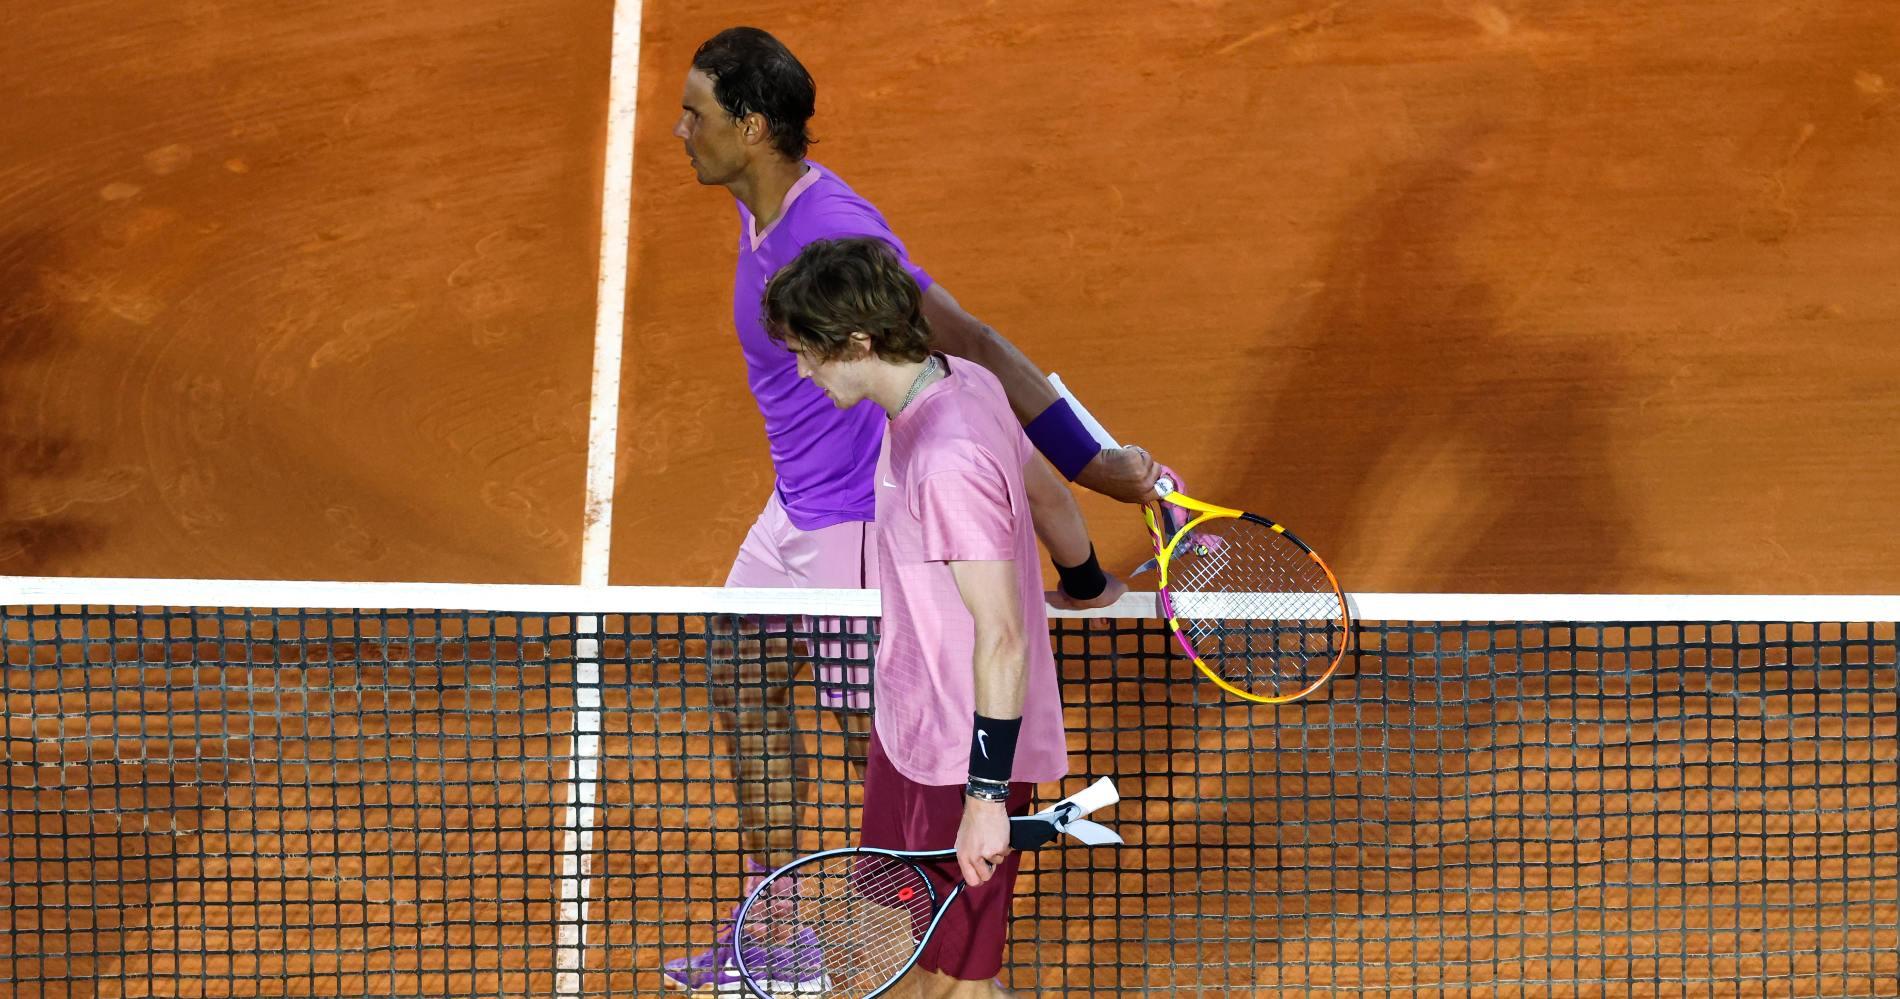 Nadal et Rublev, Monte-Carlo 2021